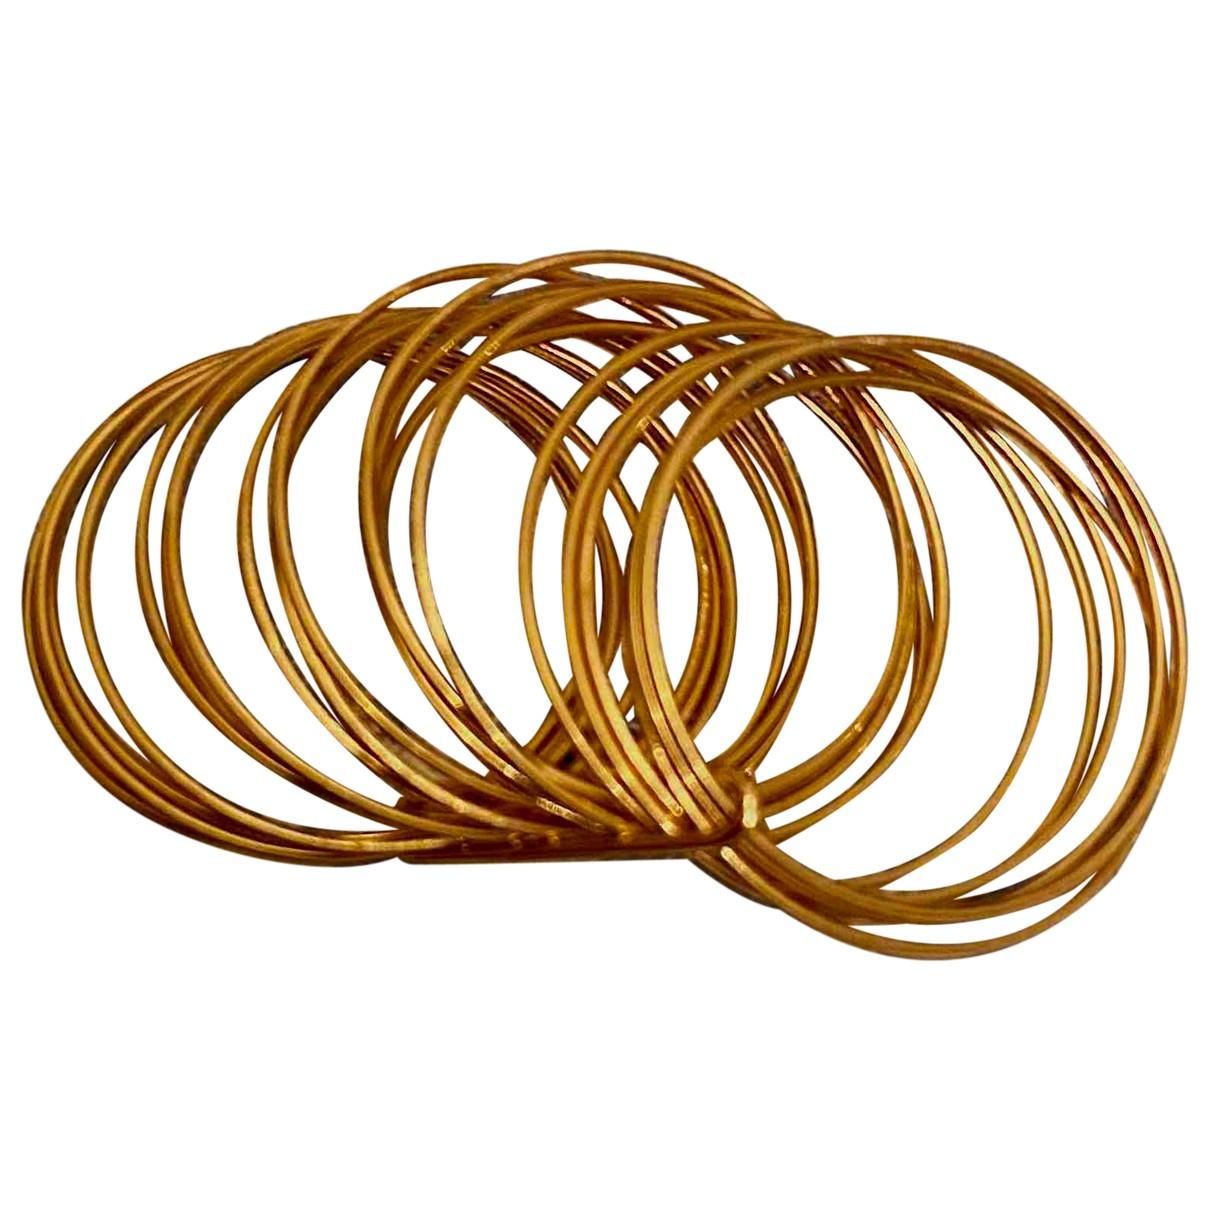 Vanrycke - Bague   pour femme en or rose - dore